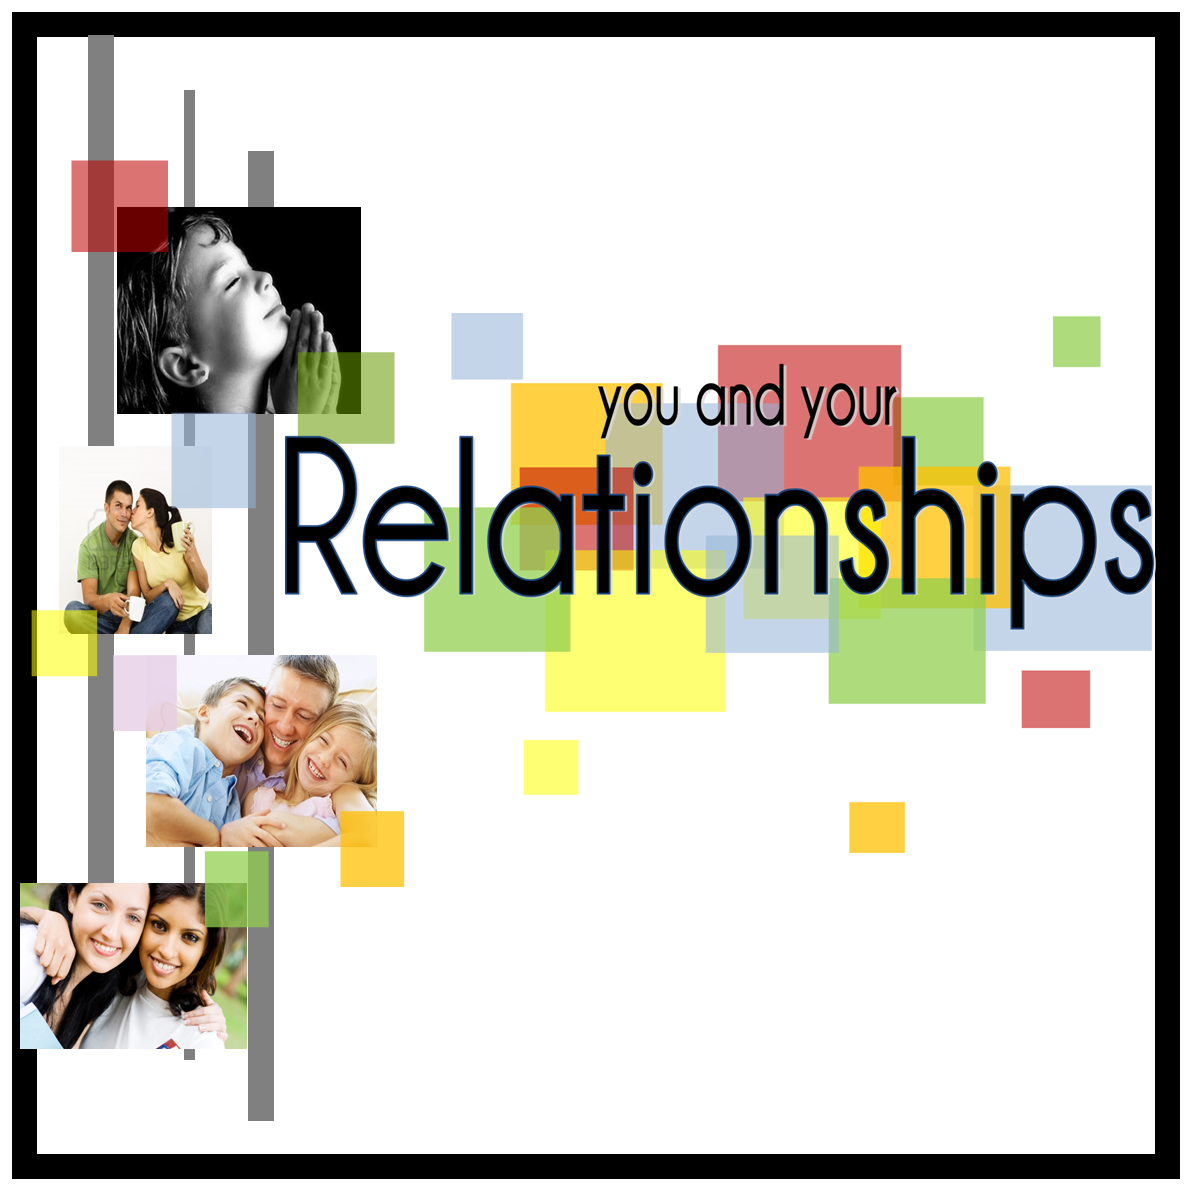 Relationships sermon header for website.png